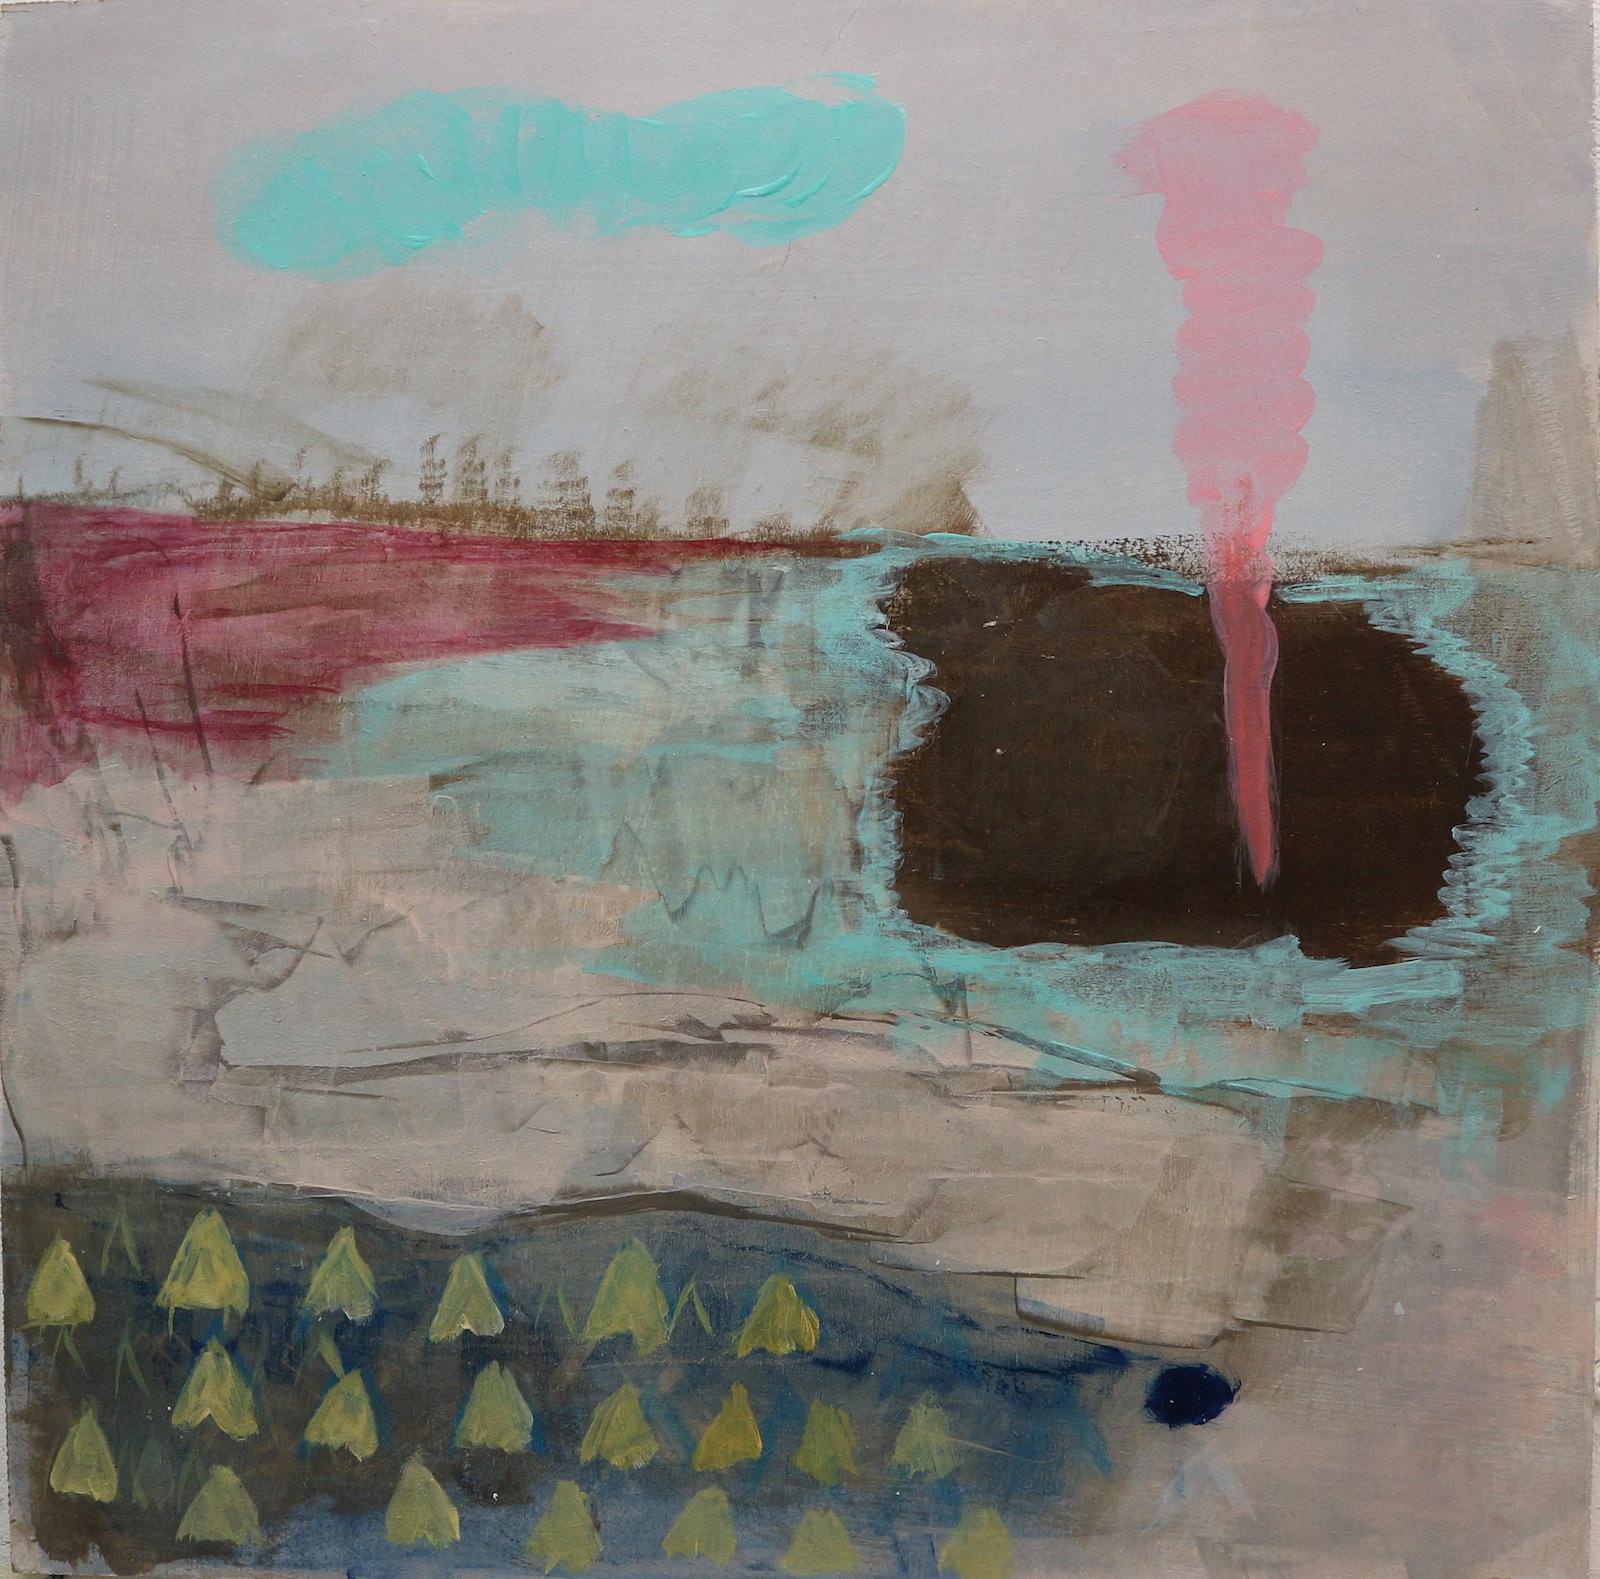 vapors and lakes, 40 cm x 40 cm, acrylic on mdf, 2016, Jane Hughes